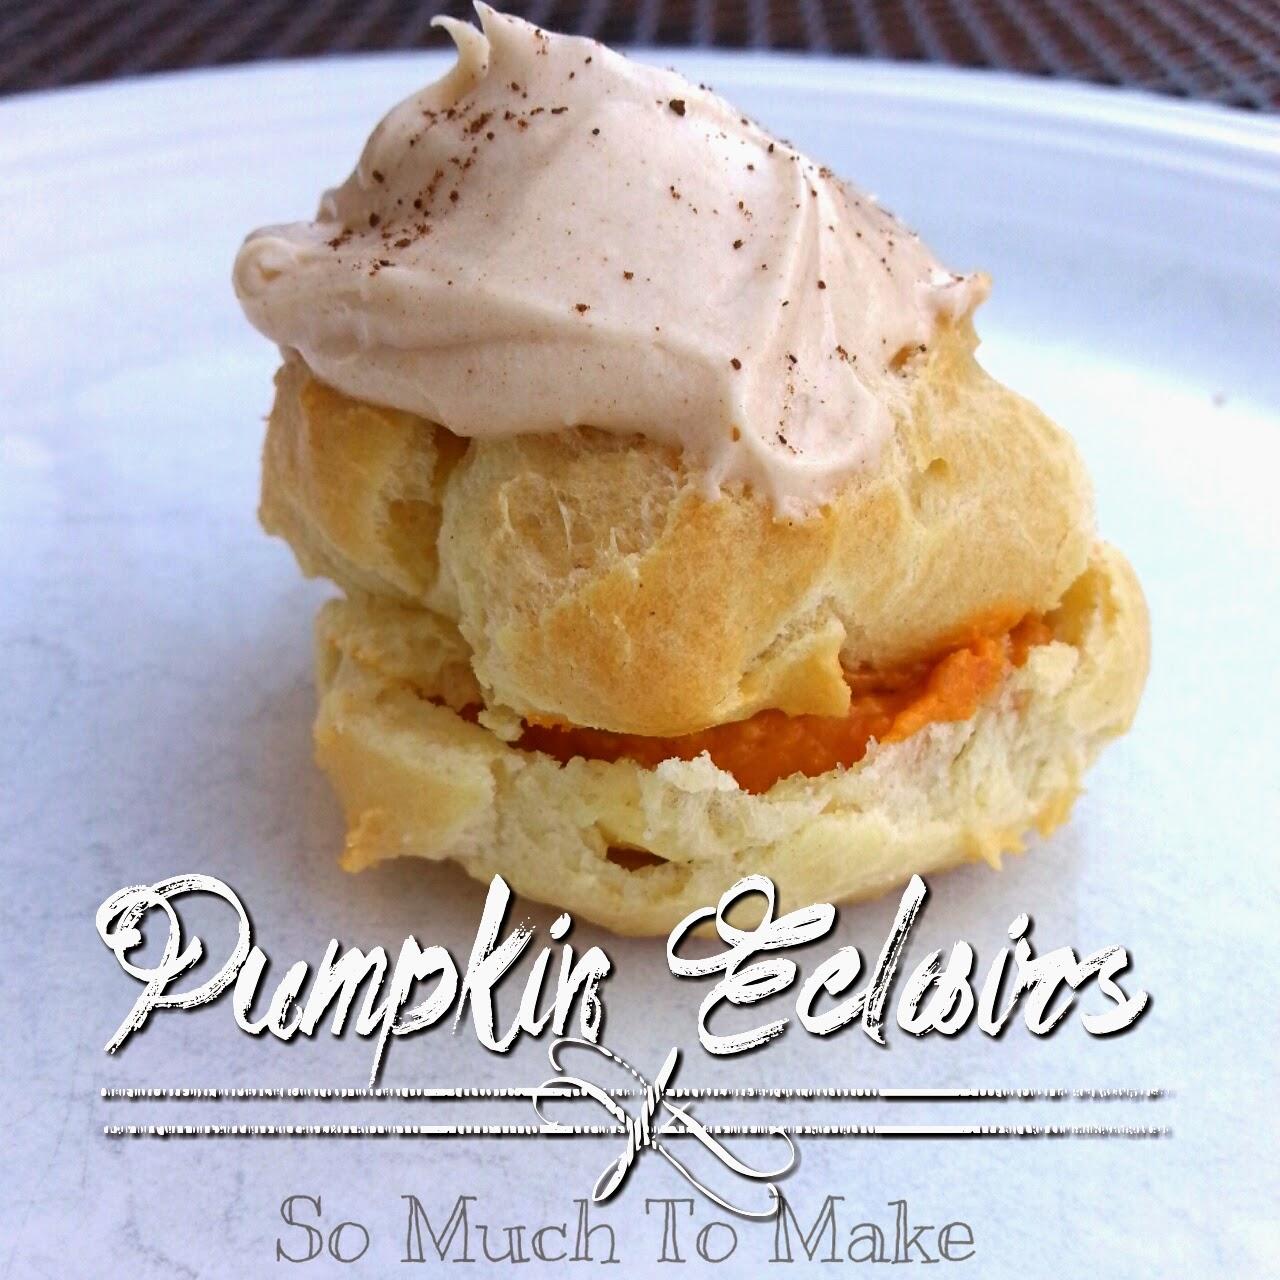 Pumpkin Eclairs